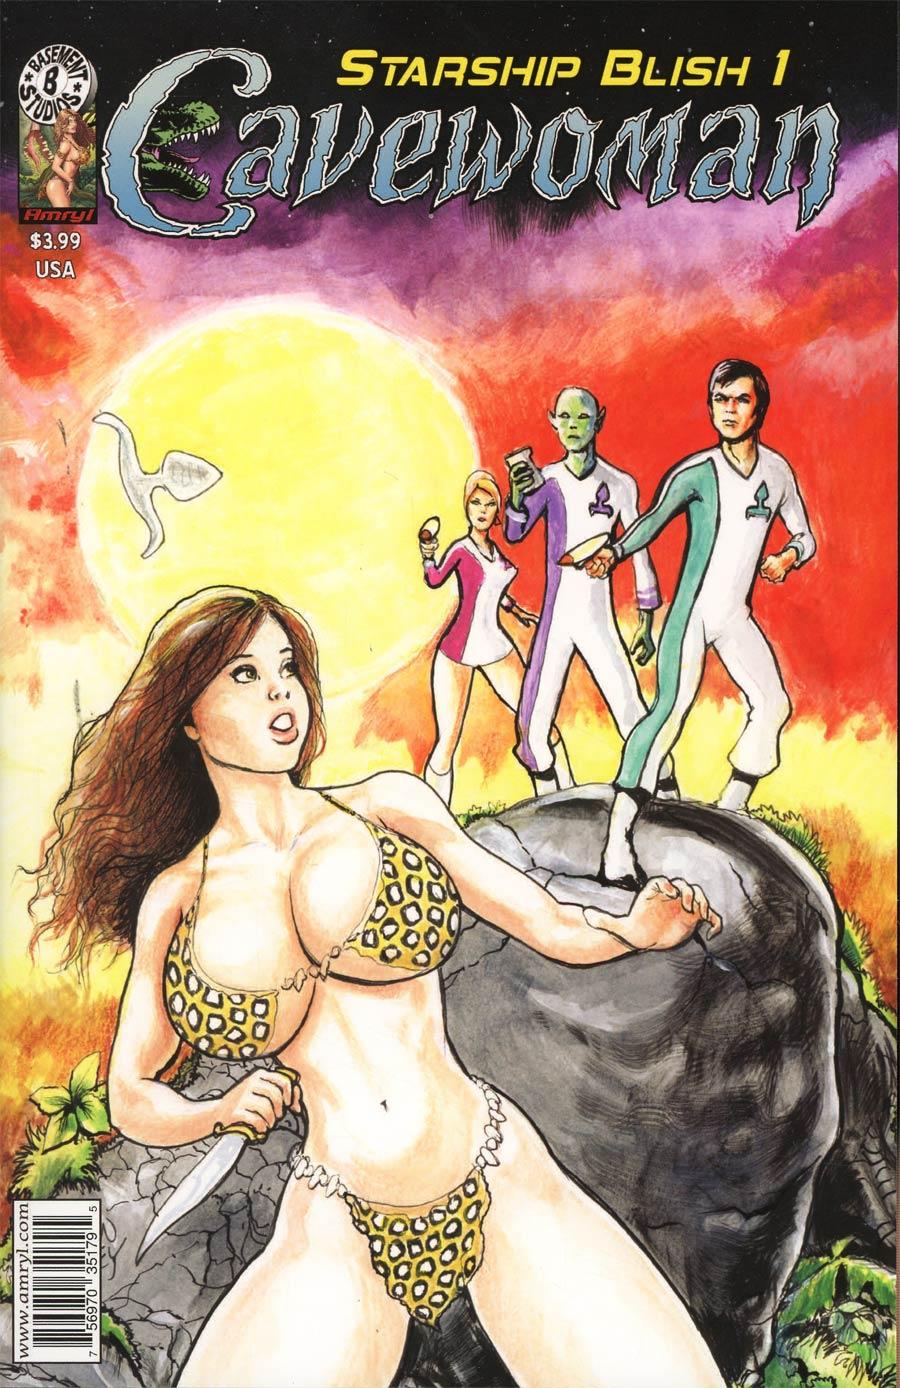 Cavewoman Starship Blish #1 Cover A Regular Devon Massey Cover